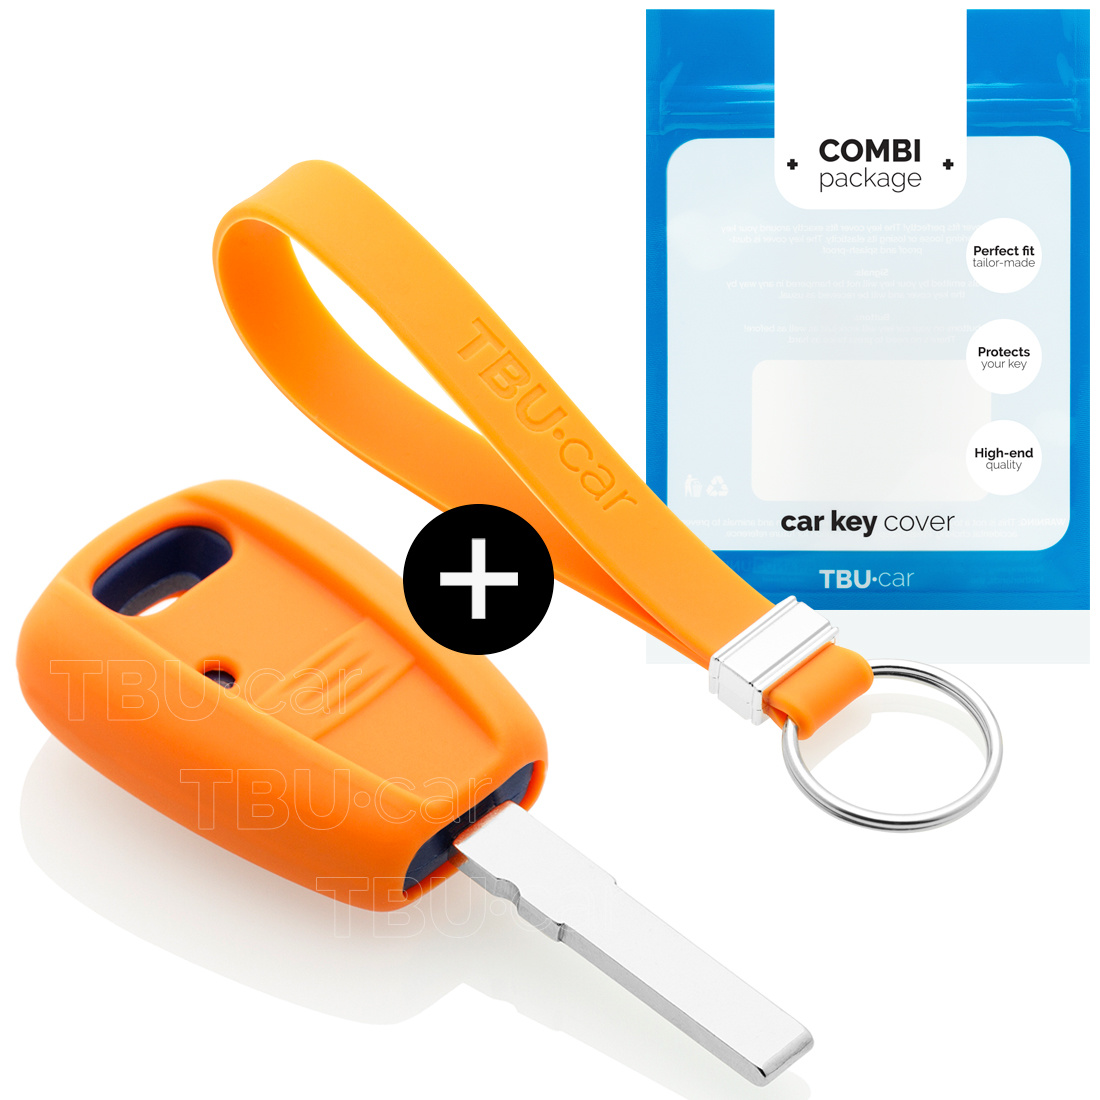 TBU car Autoschlüssel Hülle für Fiat 1 Taste - Schutzhülle aus Silikon - Auto Schlüsselhülle Cover in Orange